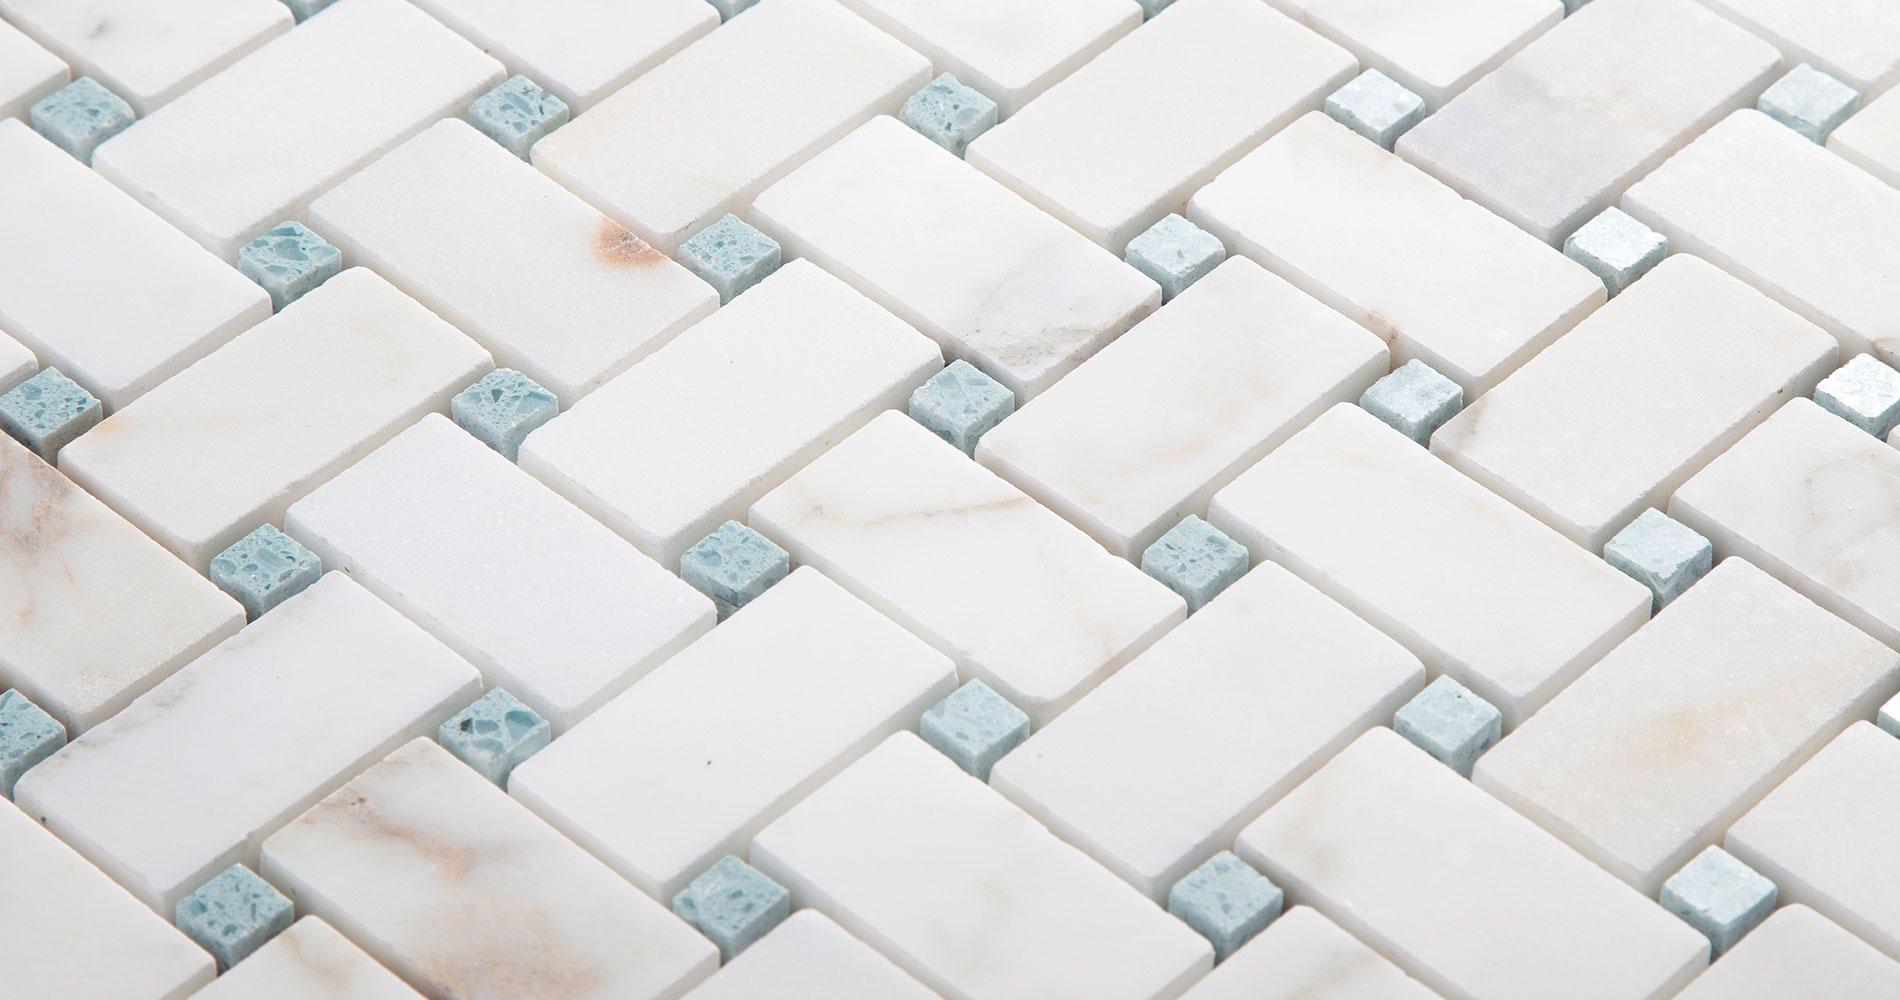 centurymosaic-Calacatta-Gold-Marble-Basketweave-Mosaic-Tile-Collection-6